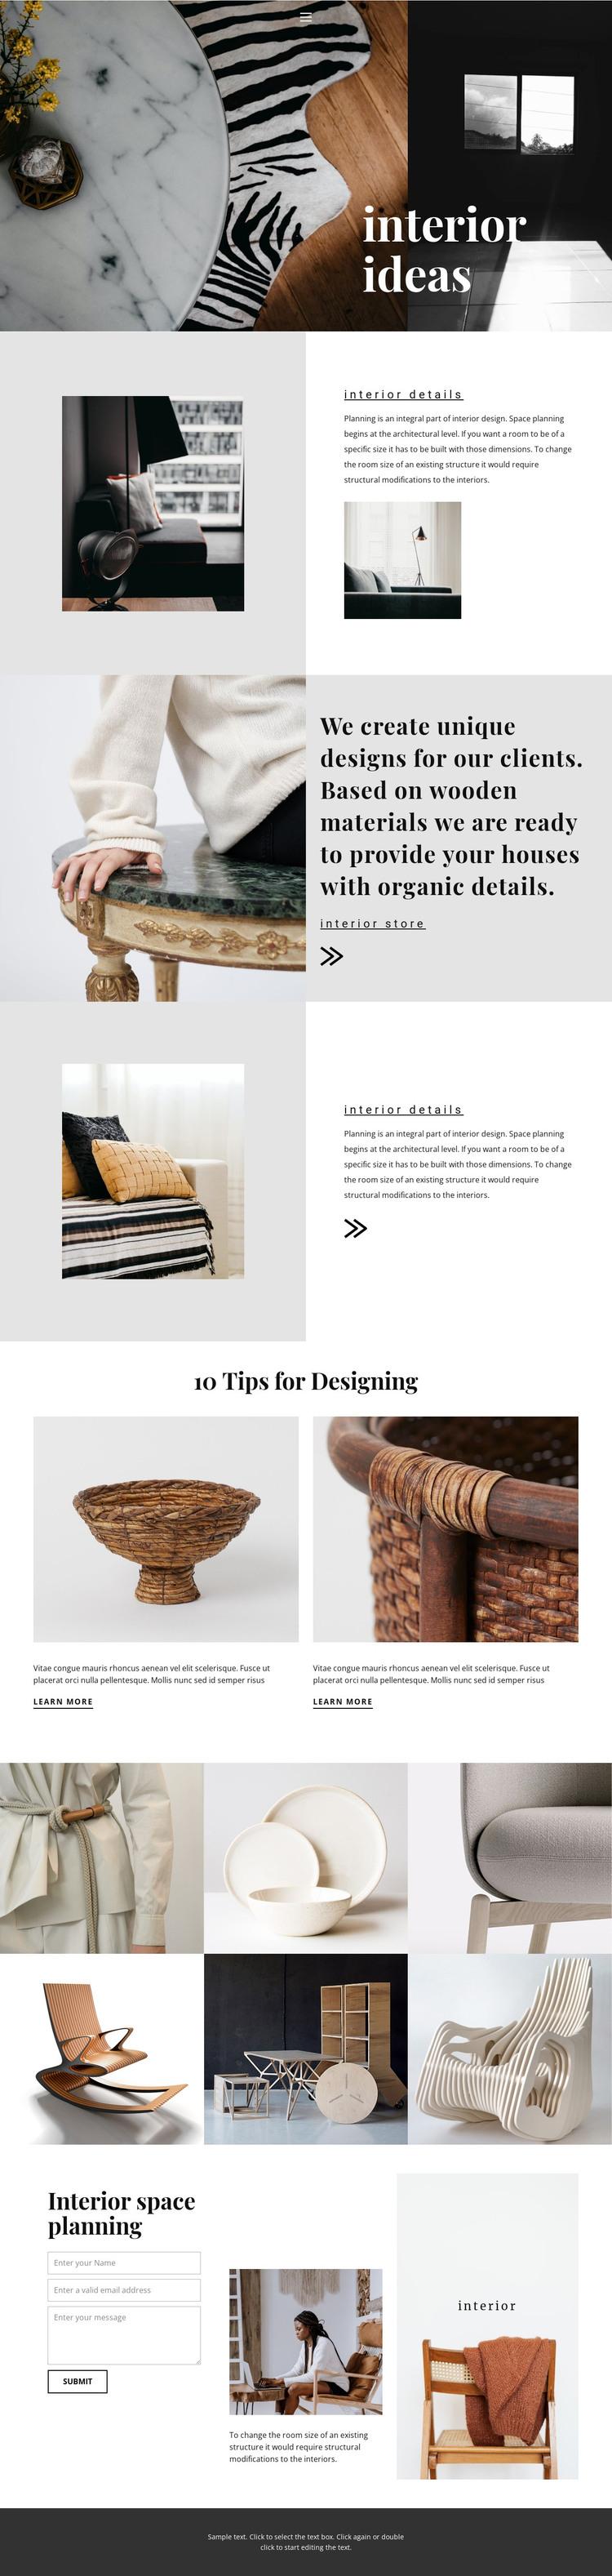 New interior ideas WordPress Theme